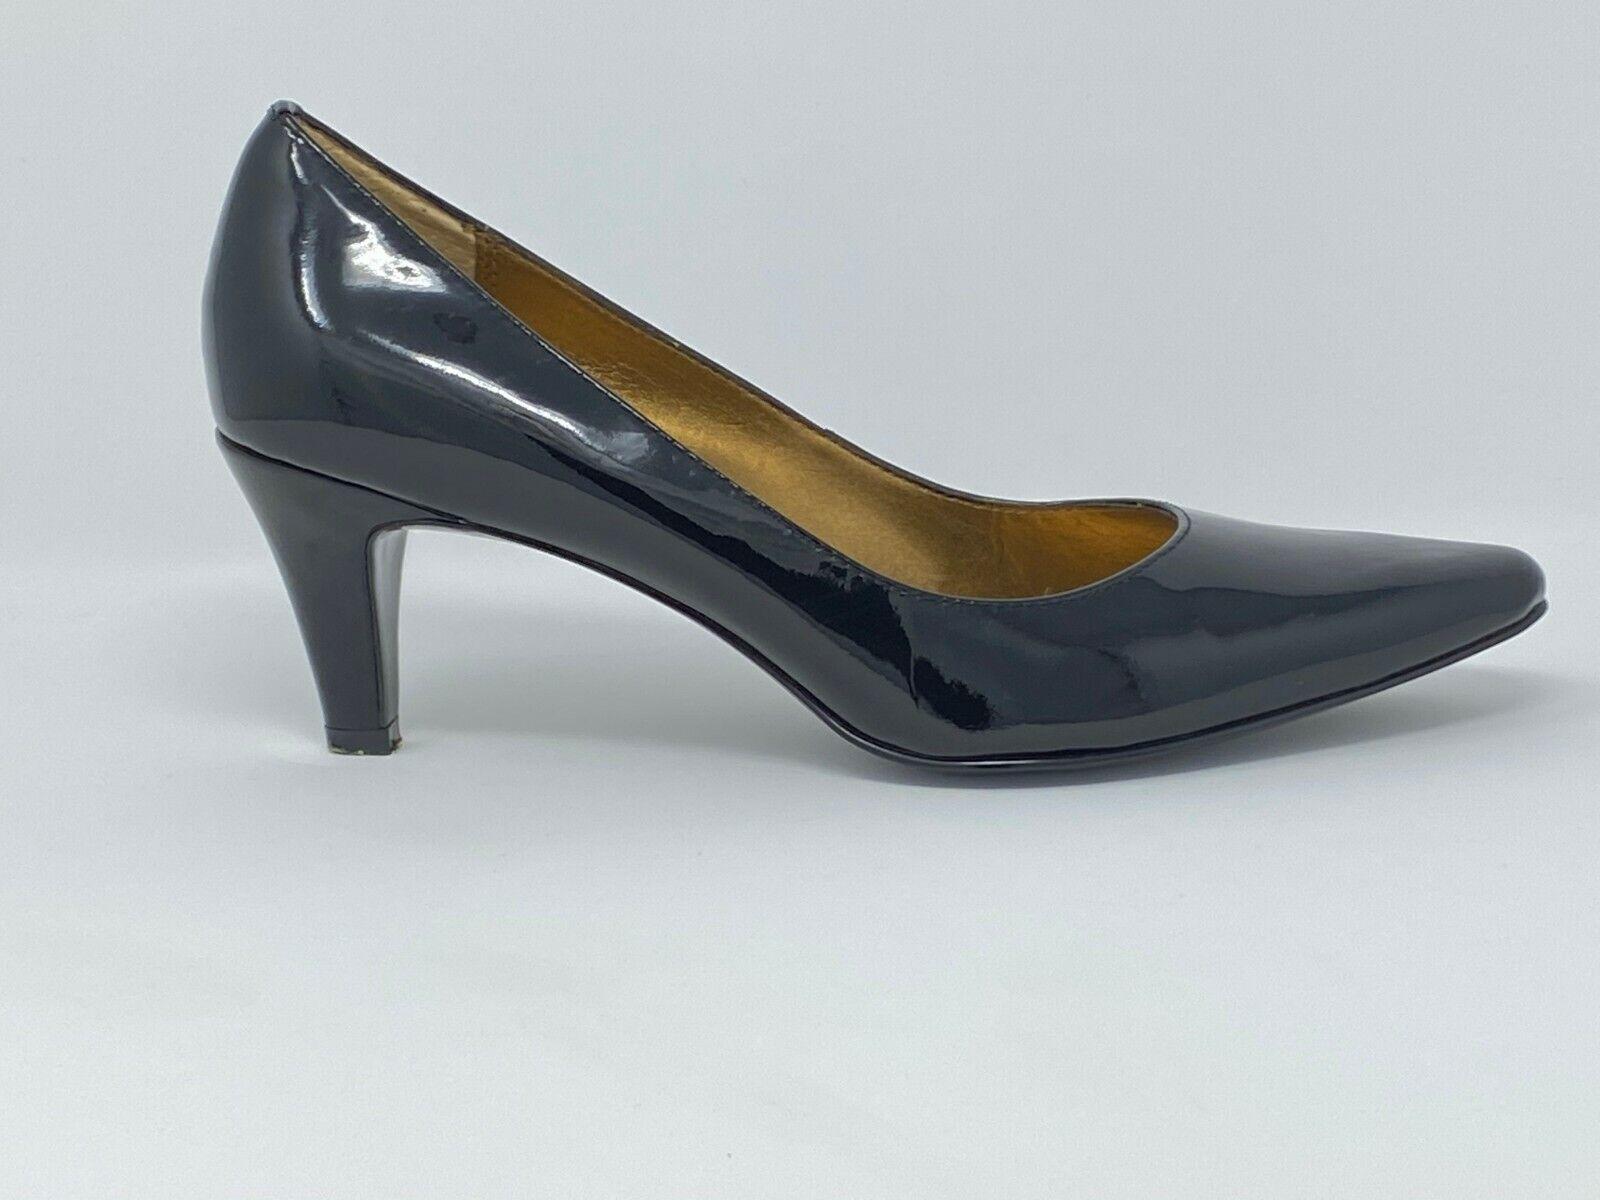 AK Anne Klein Women's High Heel Shoes Black Size 6 M Pointed Toe Pump Slip On